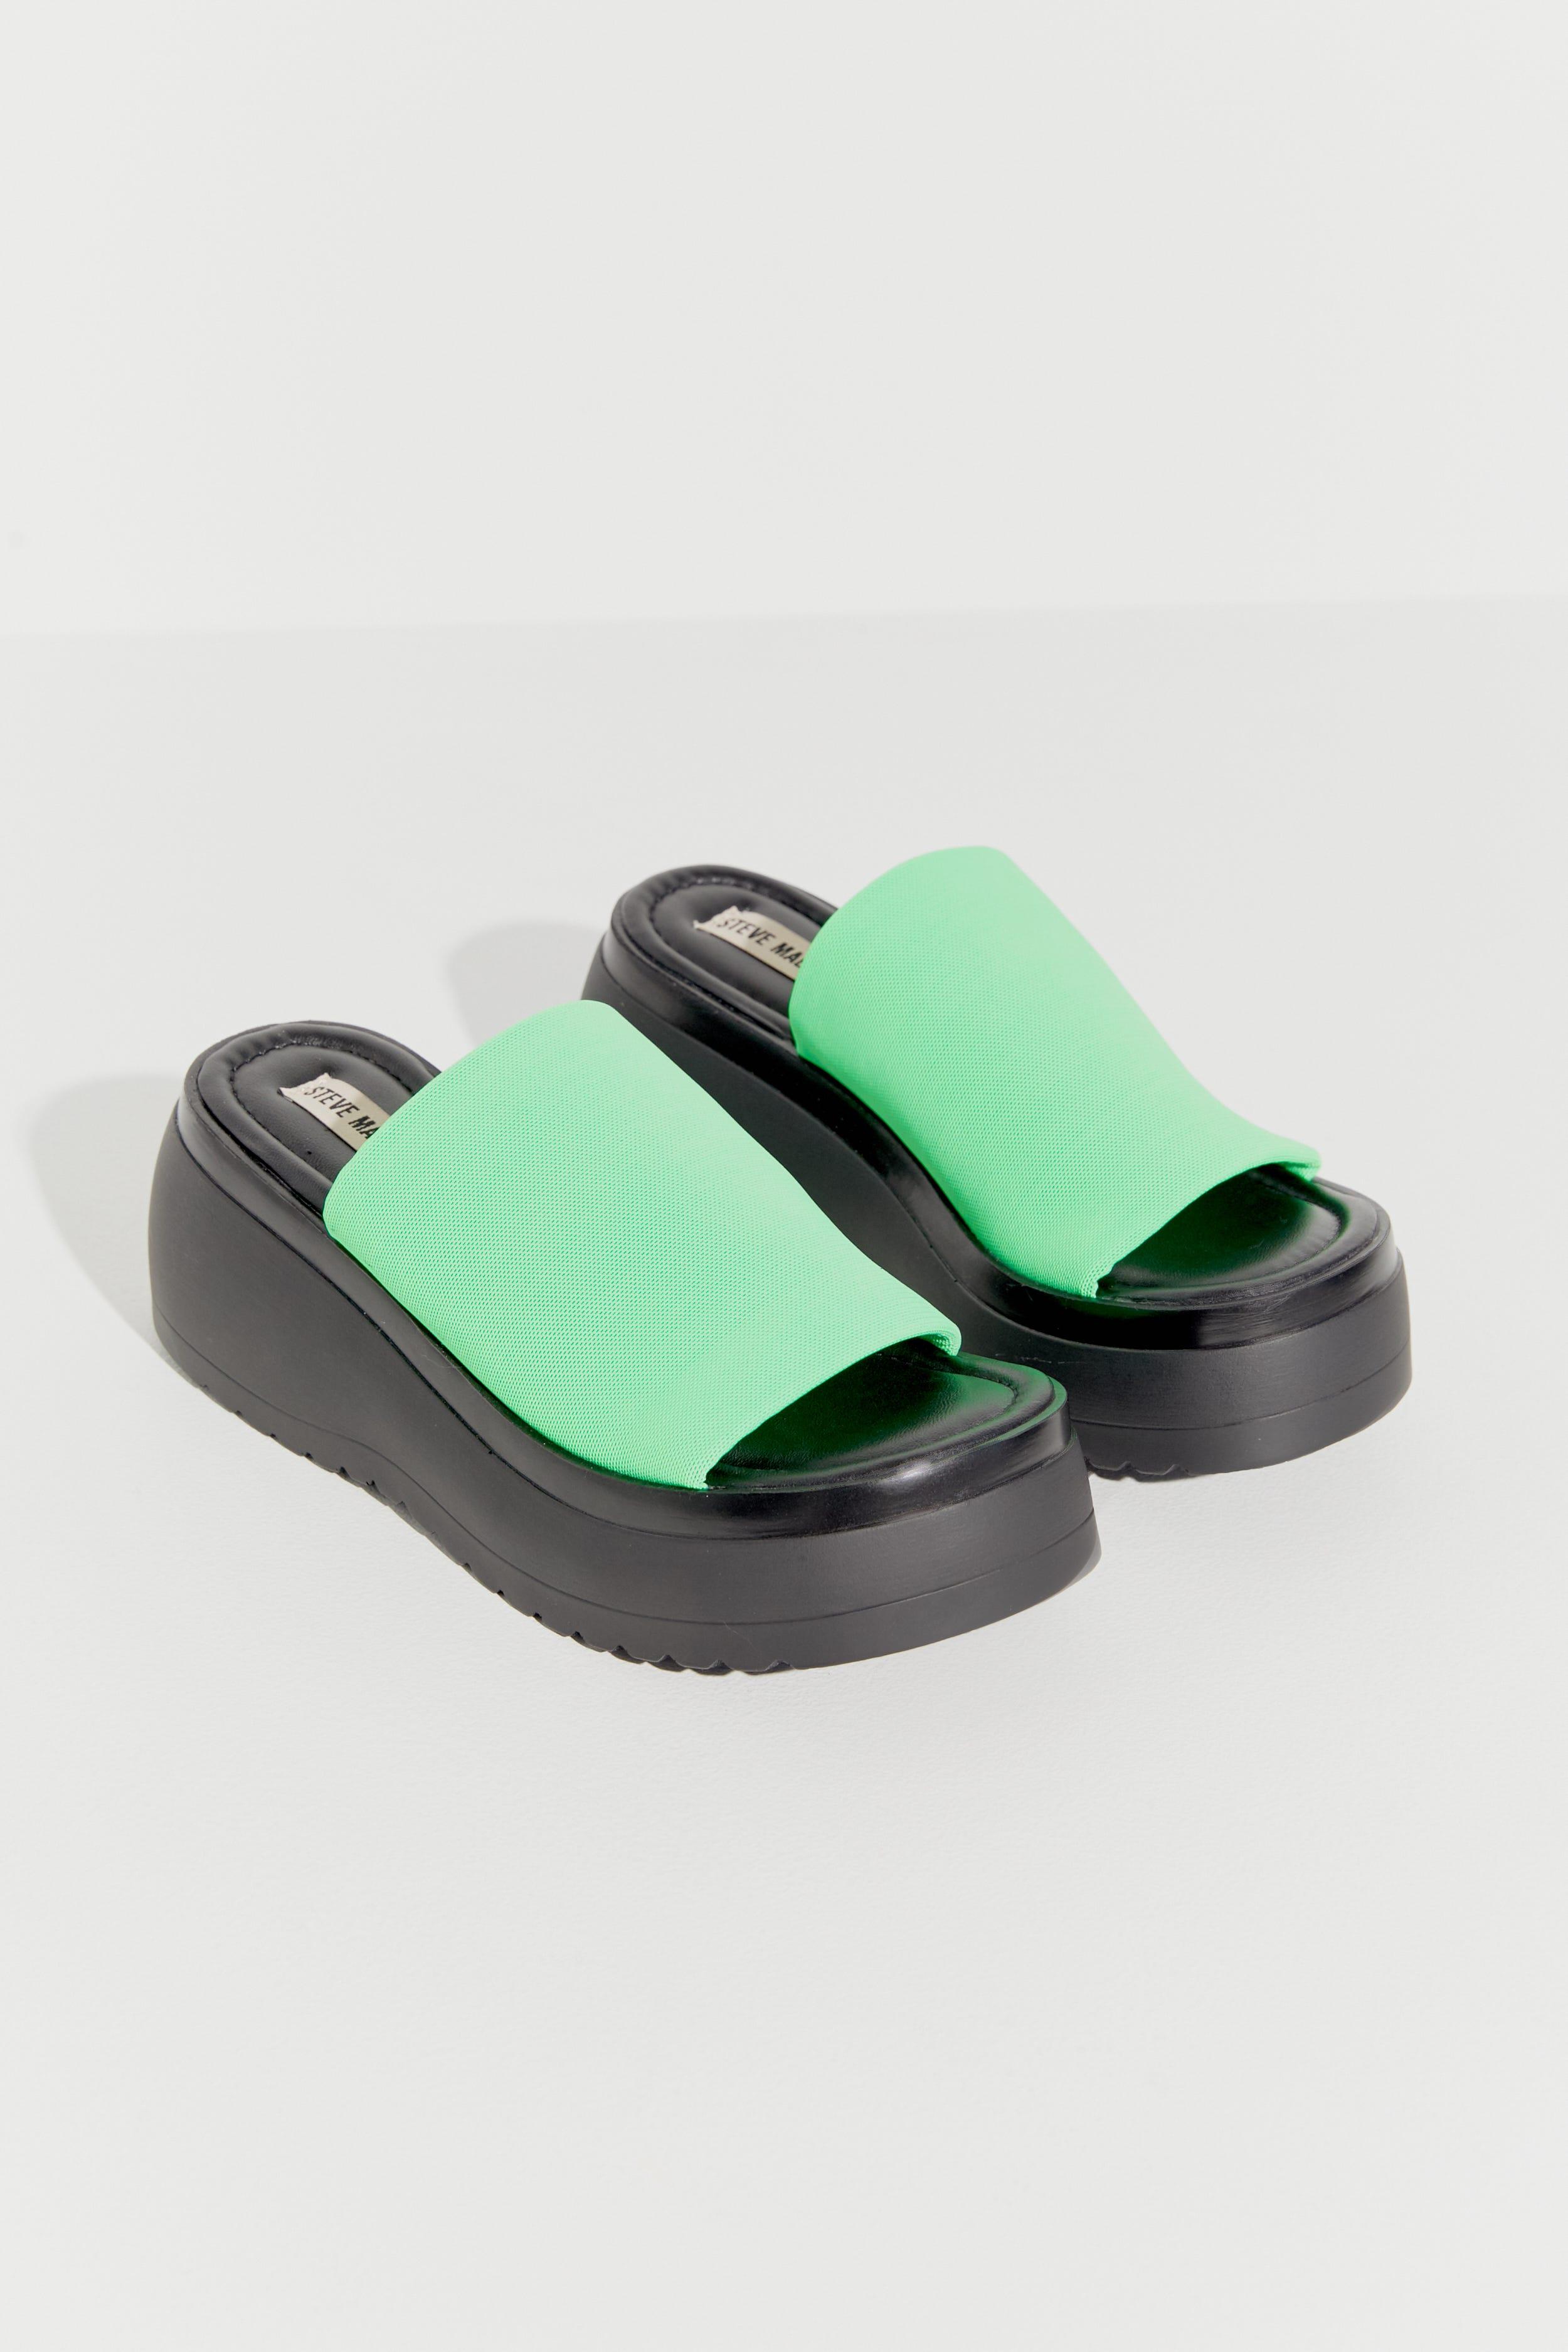 40a479fc327 Steve Madden X Urban Outfitters 90s Platform Sandals